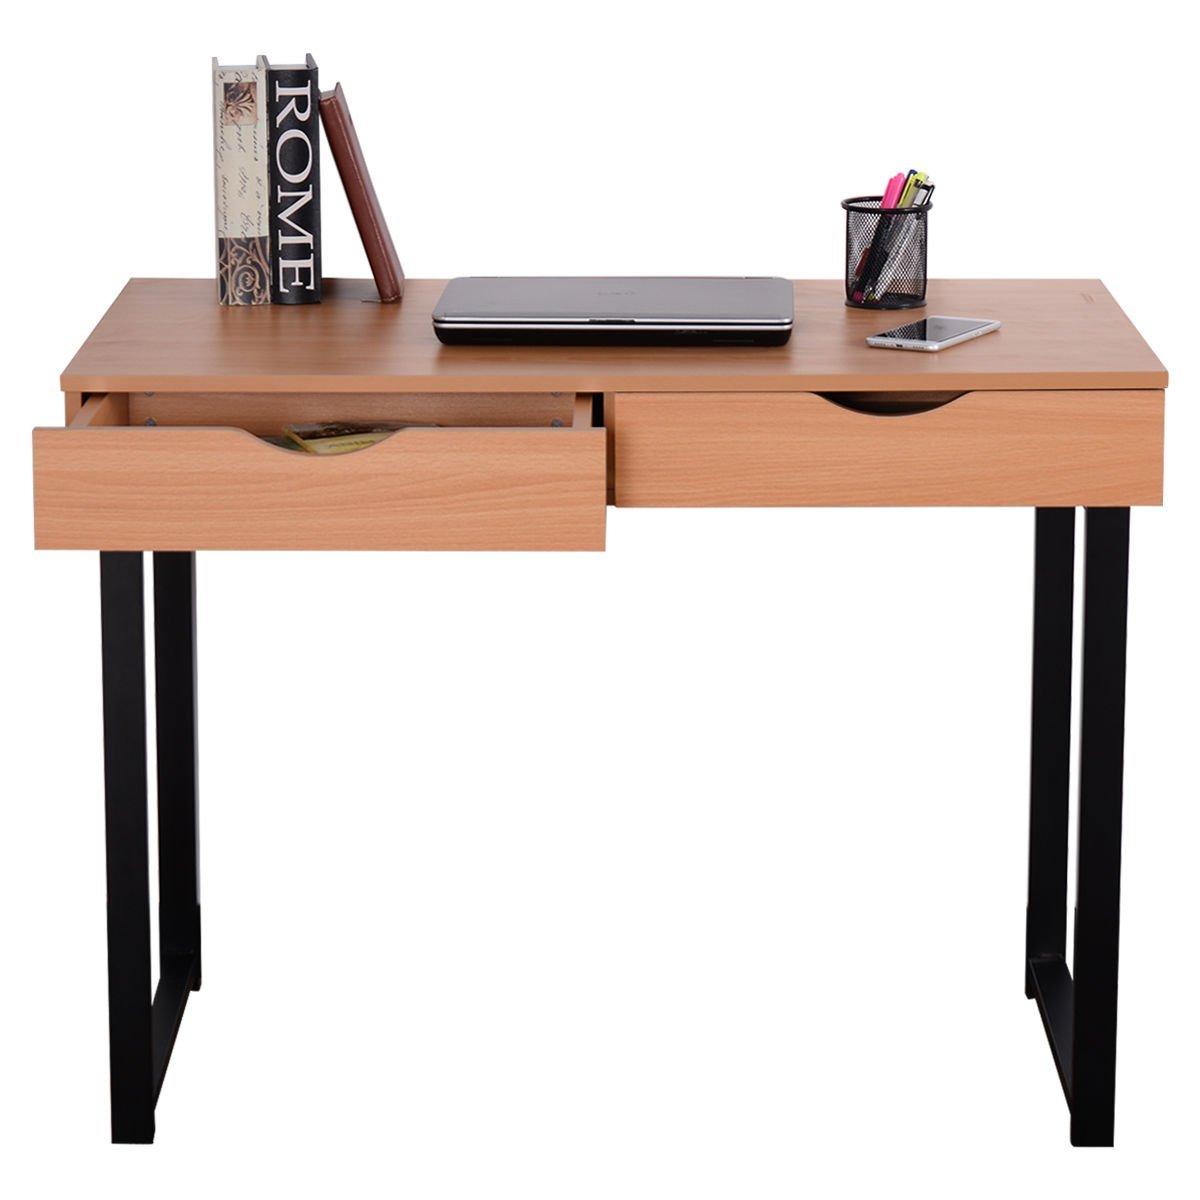 New Wood 2 Drawers Workstation Table Steel Frame Home Office Modern Computer Desk